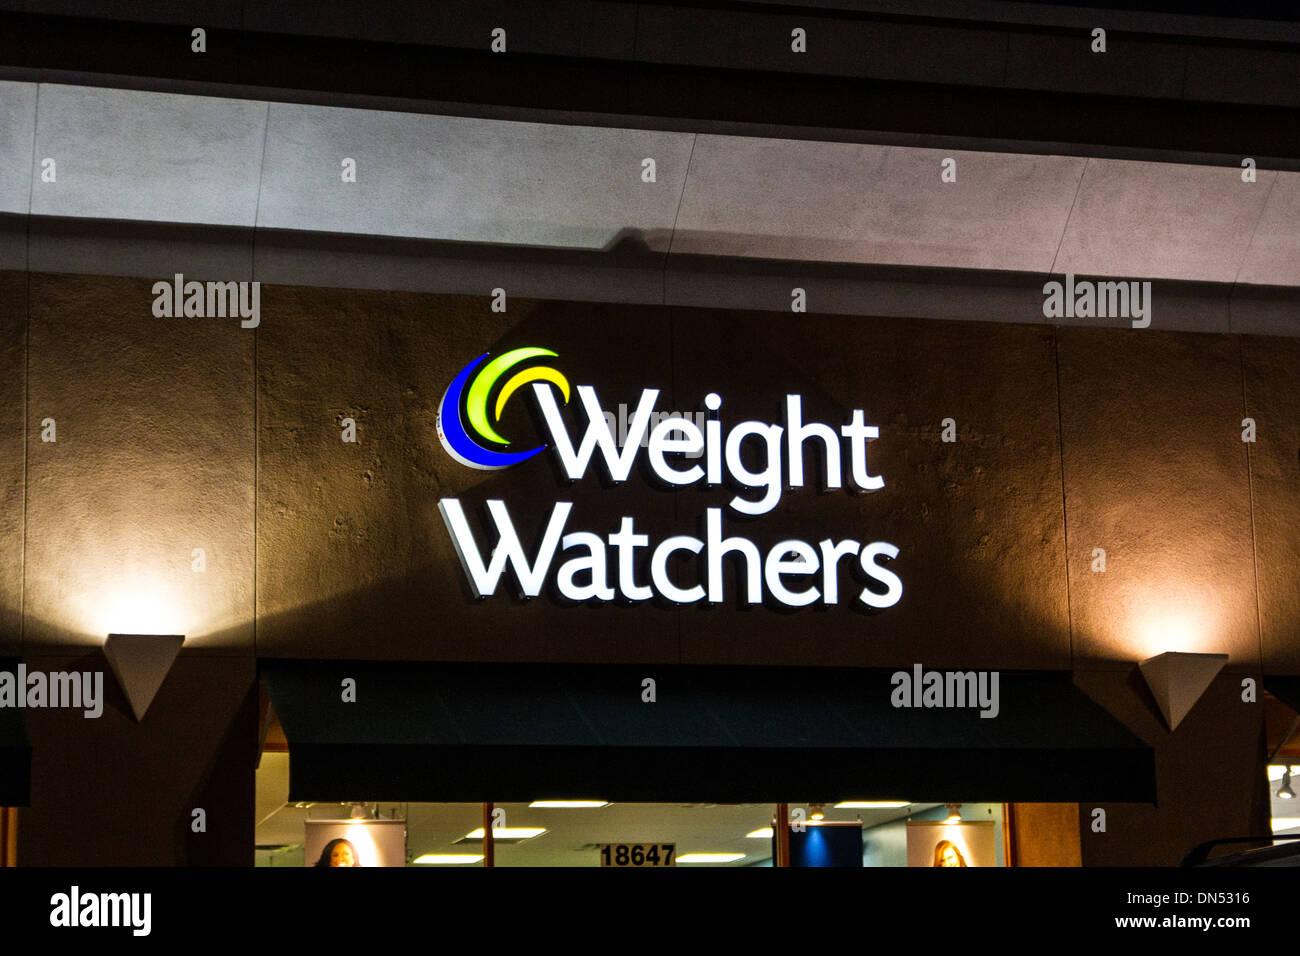 A Weight Watchers store in Northridge California - Stock Image